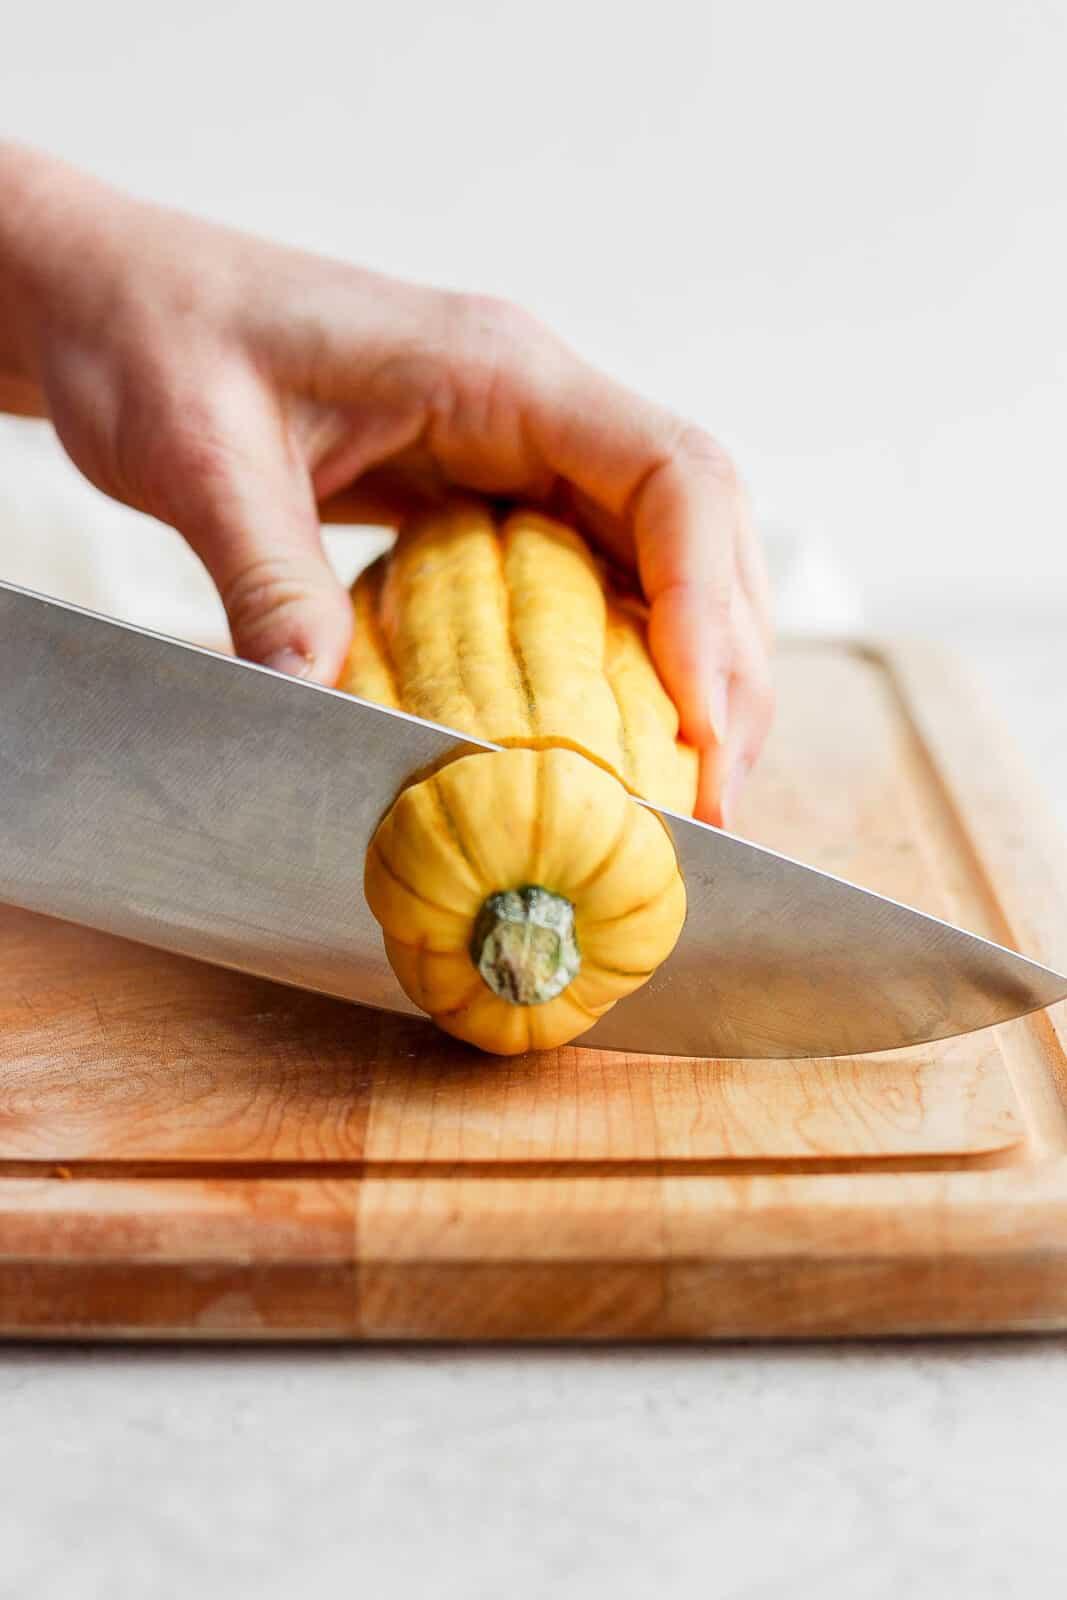 A knife cutting the top off a delicata squash.